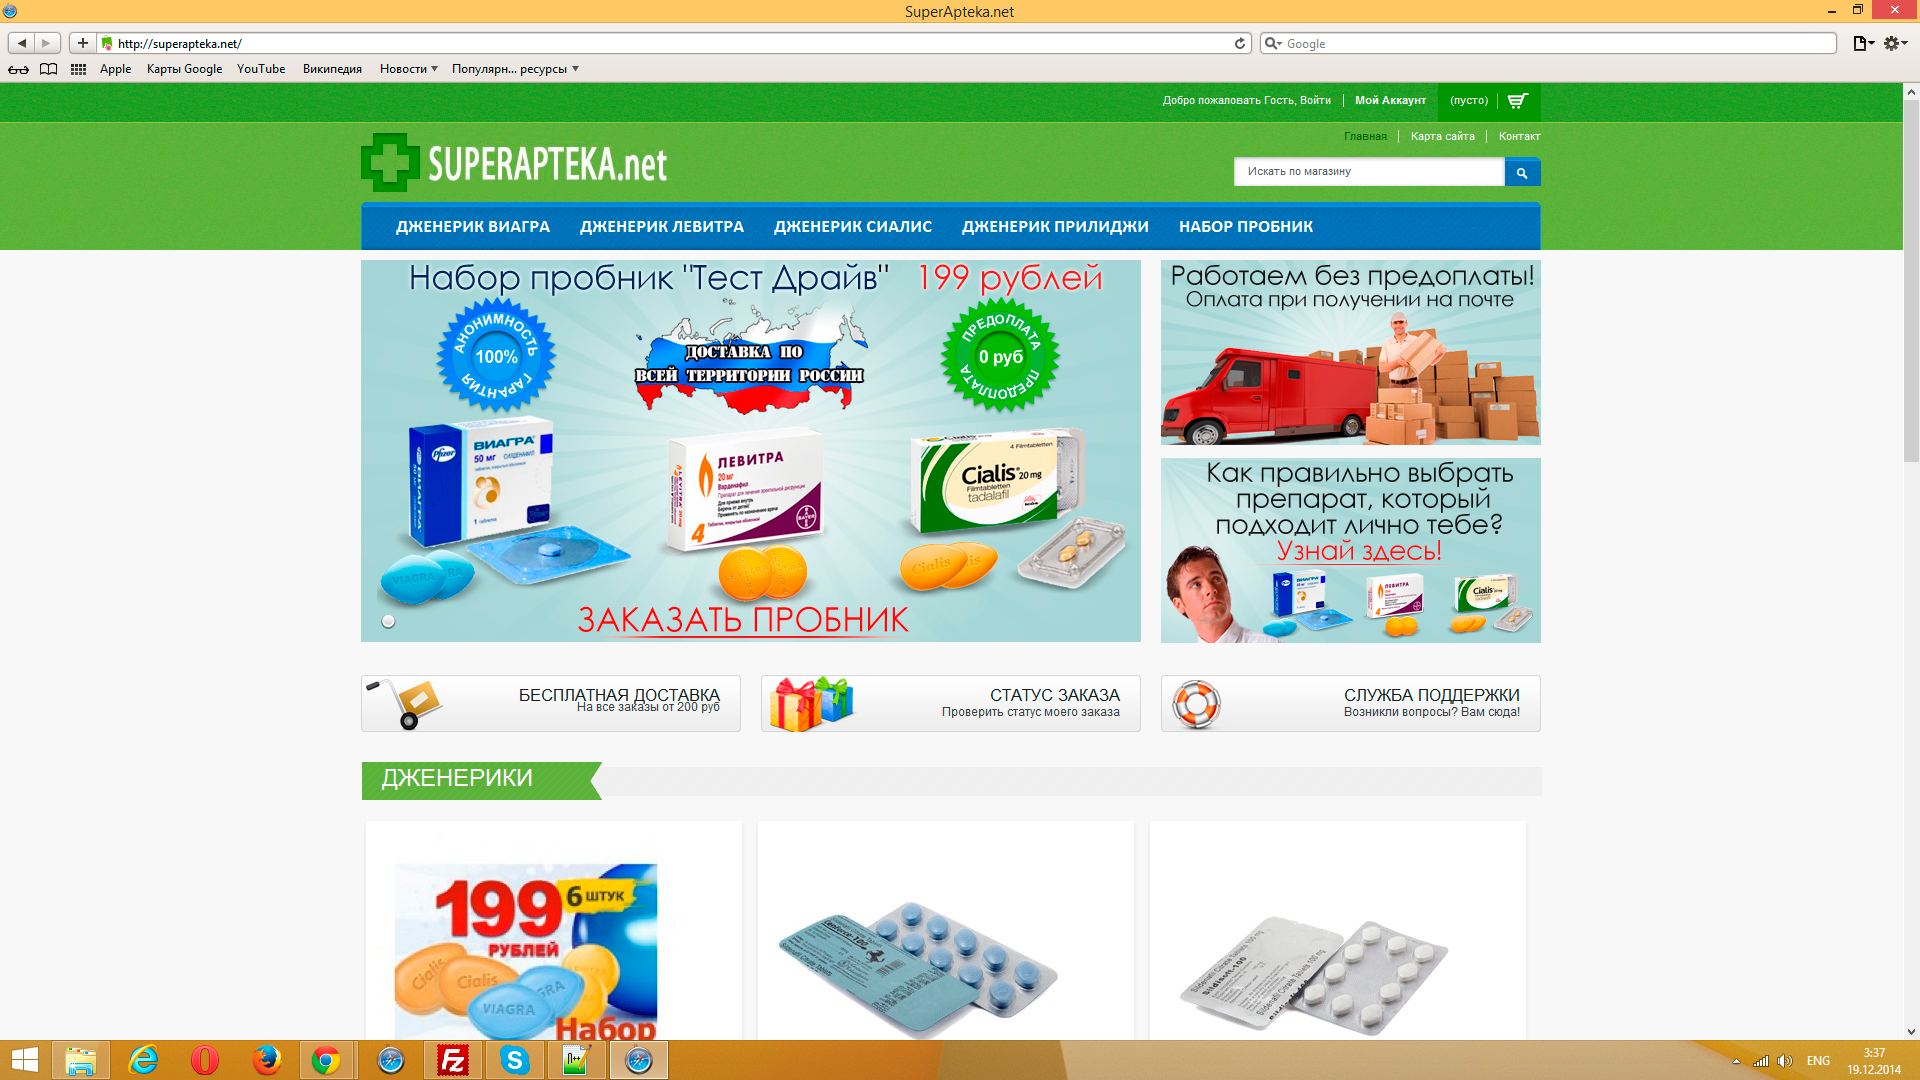 SuperApteka.net